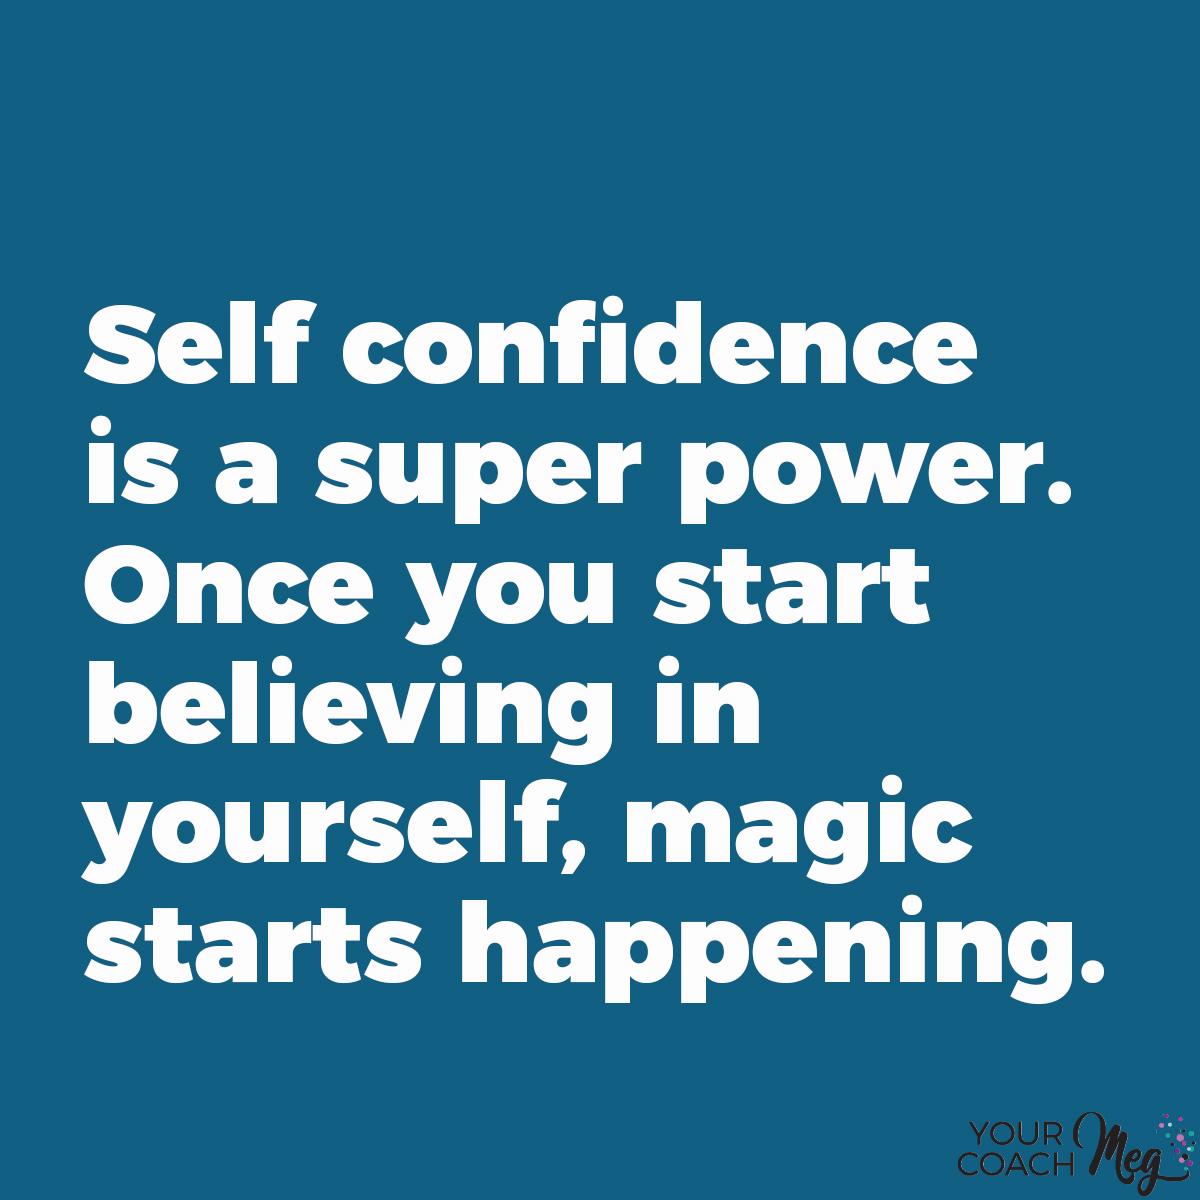 Self Confidence is a super power- Your Coach Meg